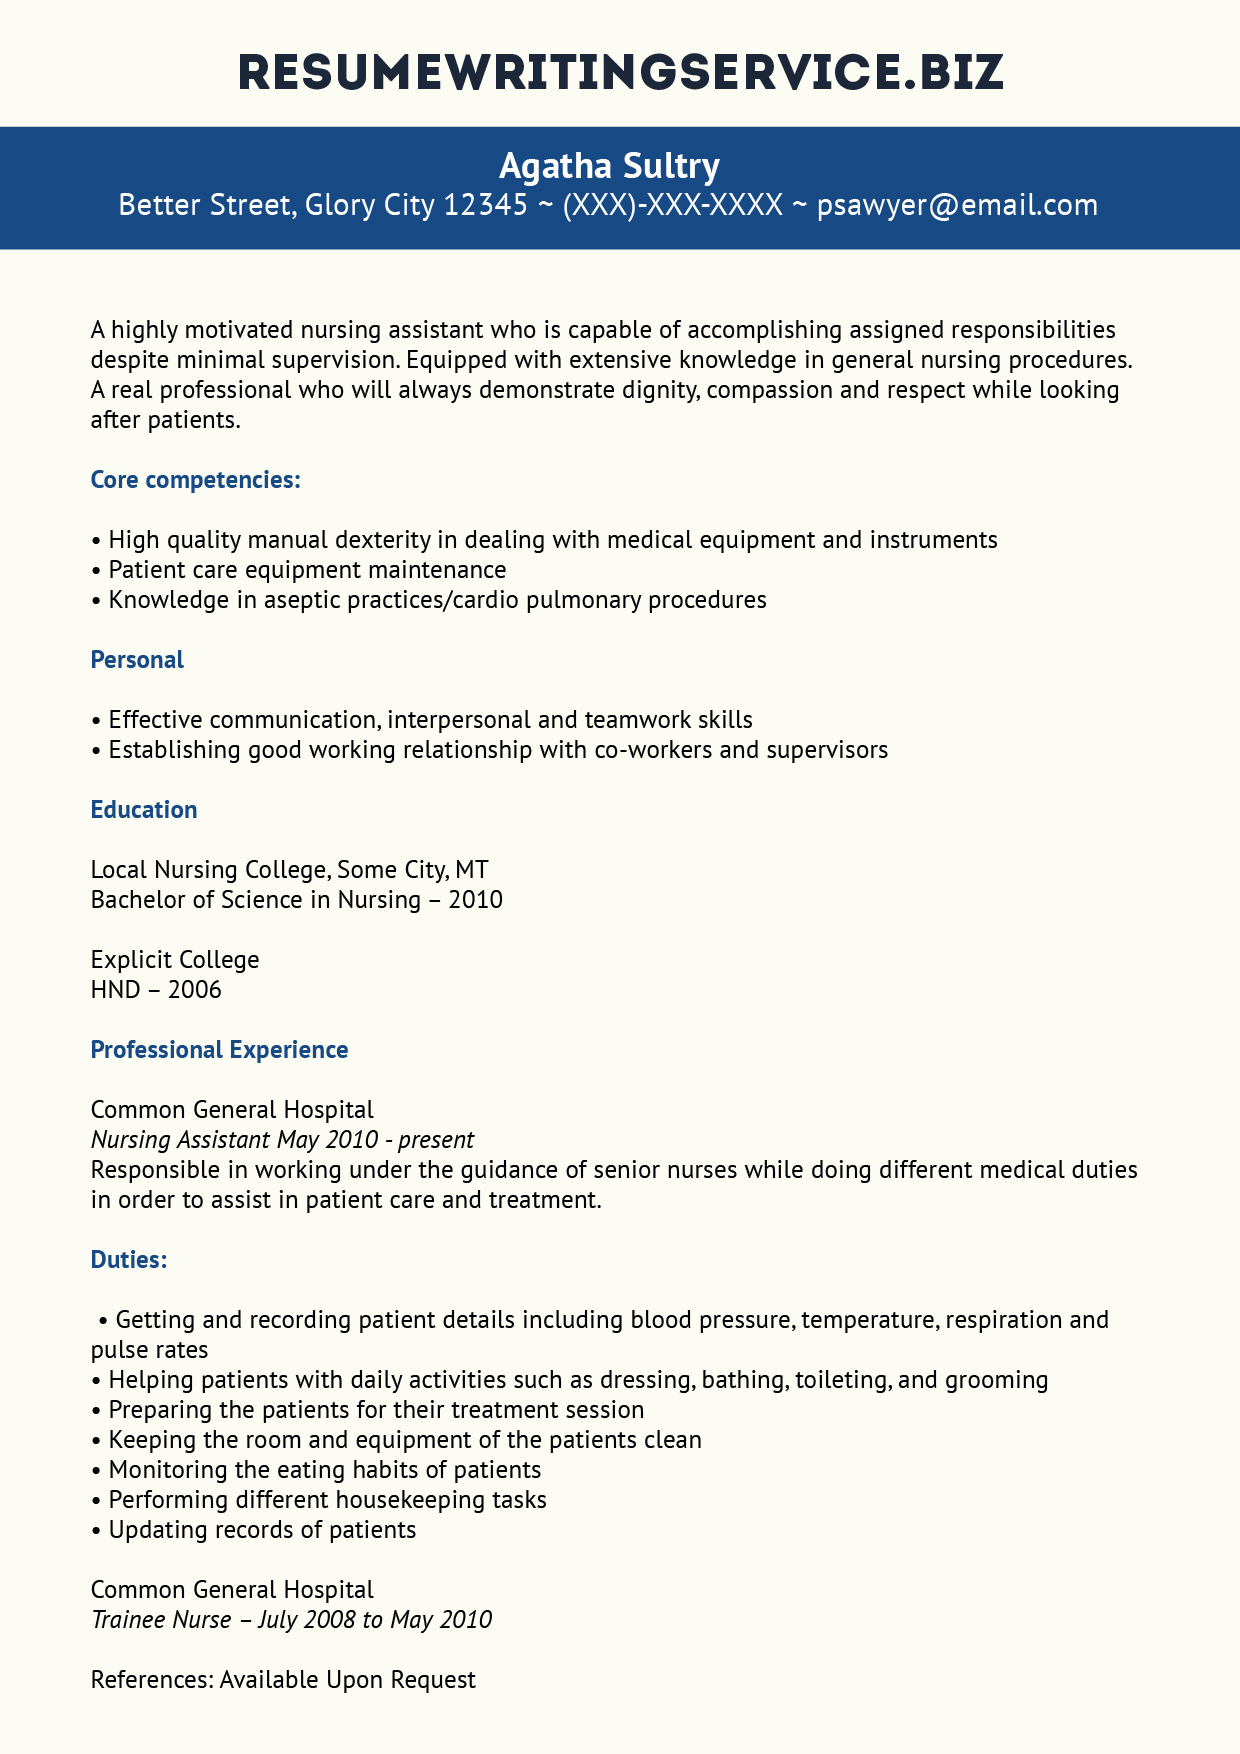 skills for nursing assistant resumes